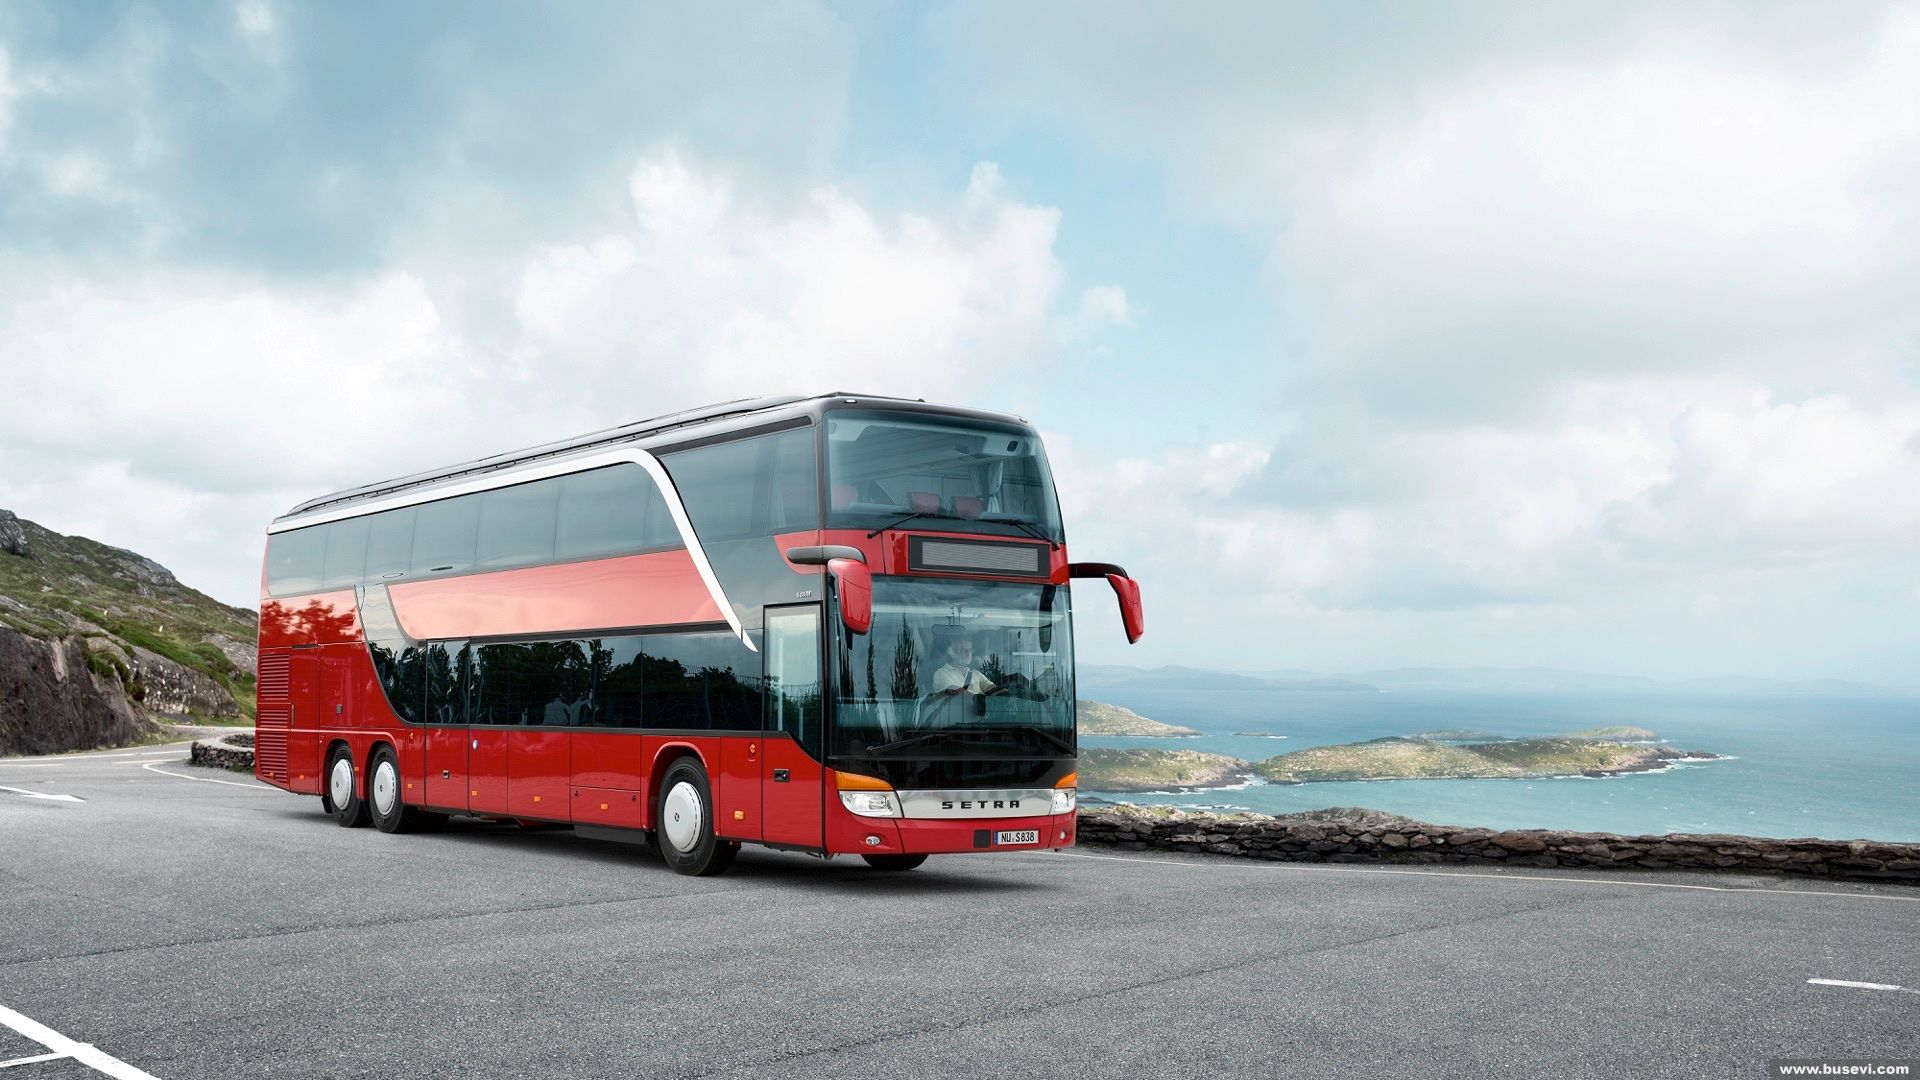 Setra S 431 Dt Autobus De Dos Pisos Autobus Dos Pisos